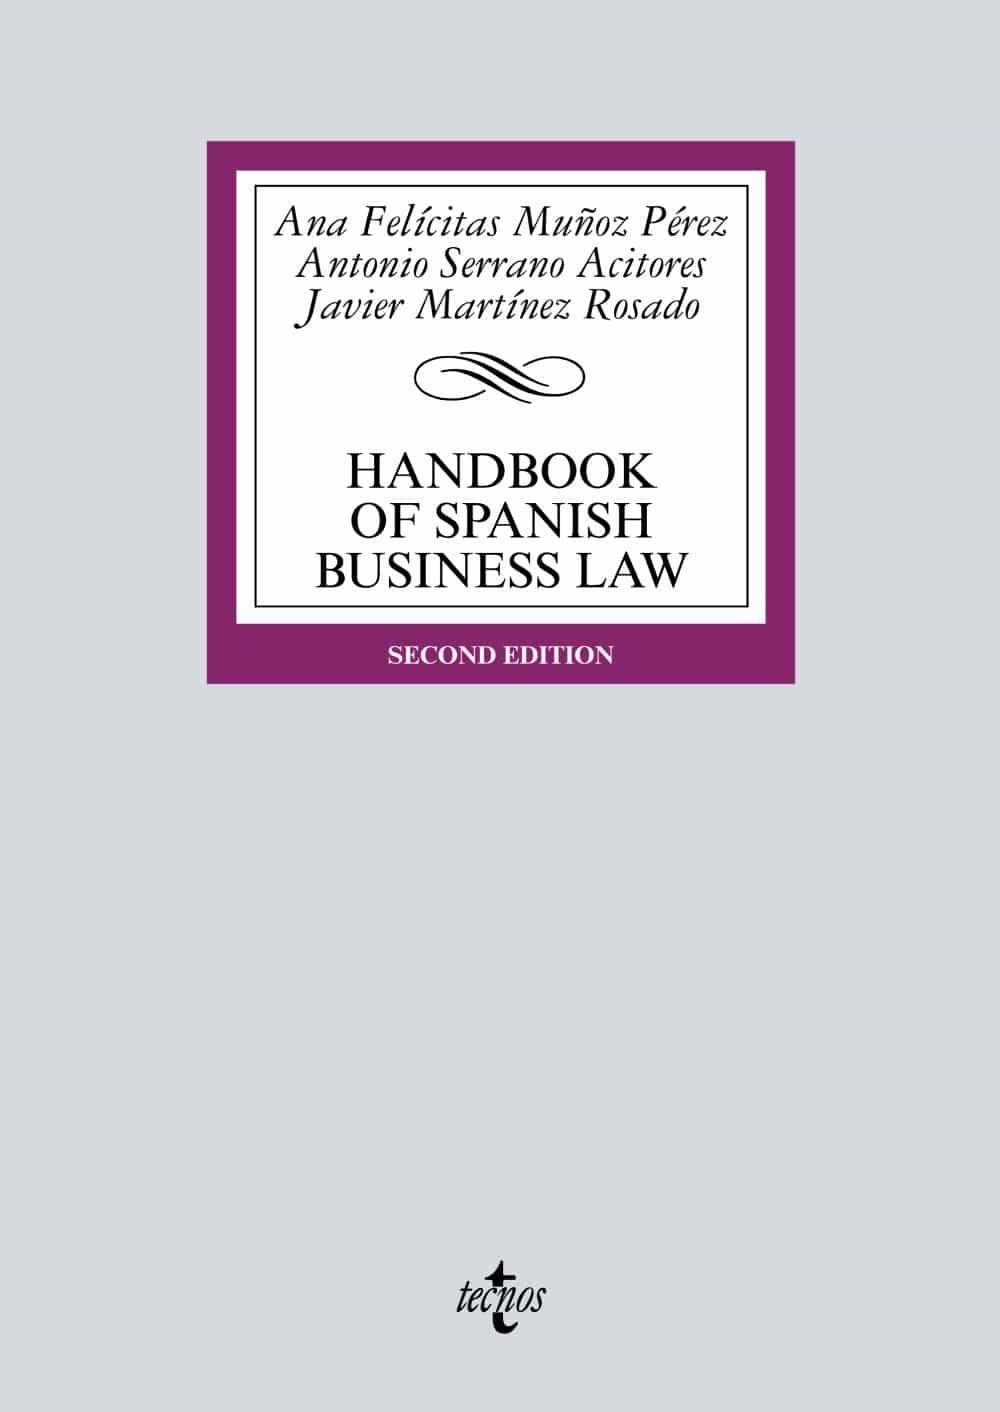 handbook of spanish business law (2ª ed.)-9788430973545